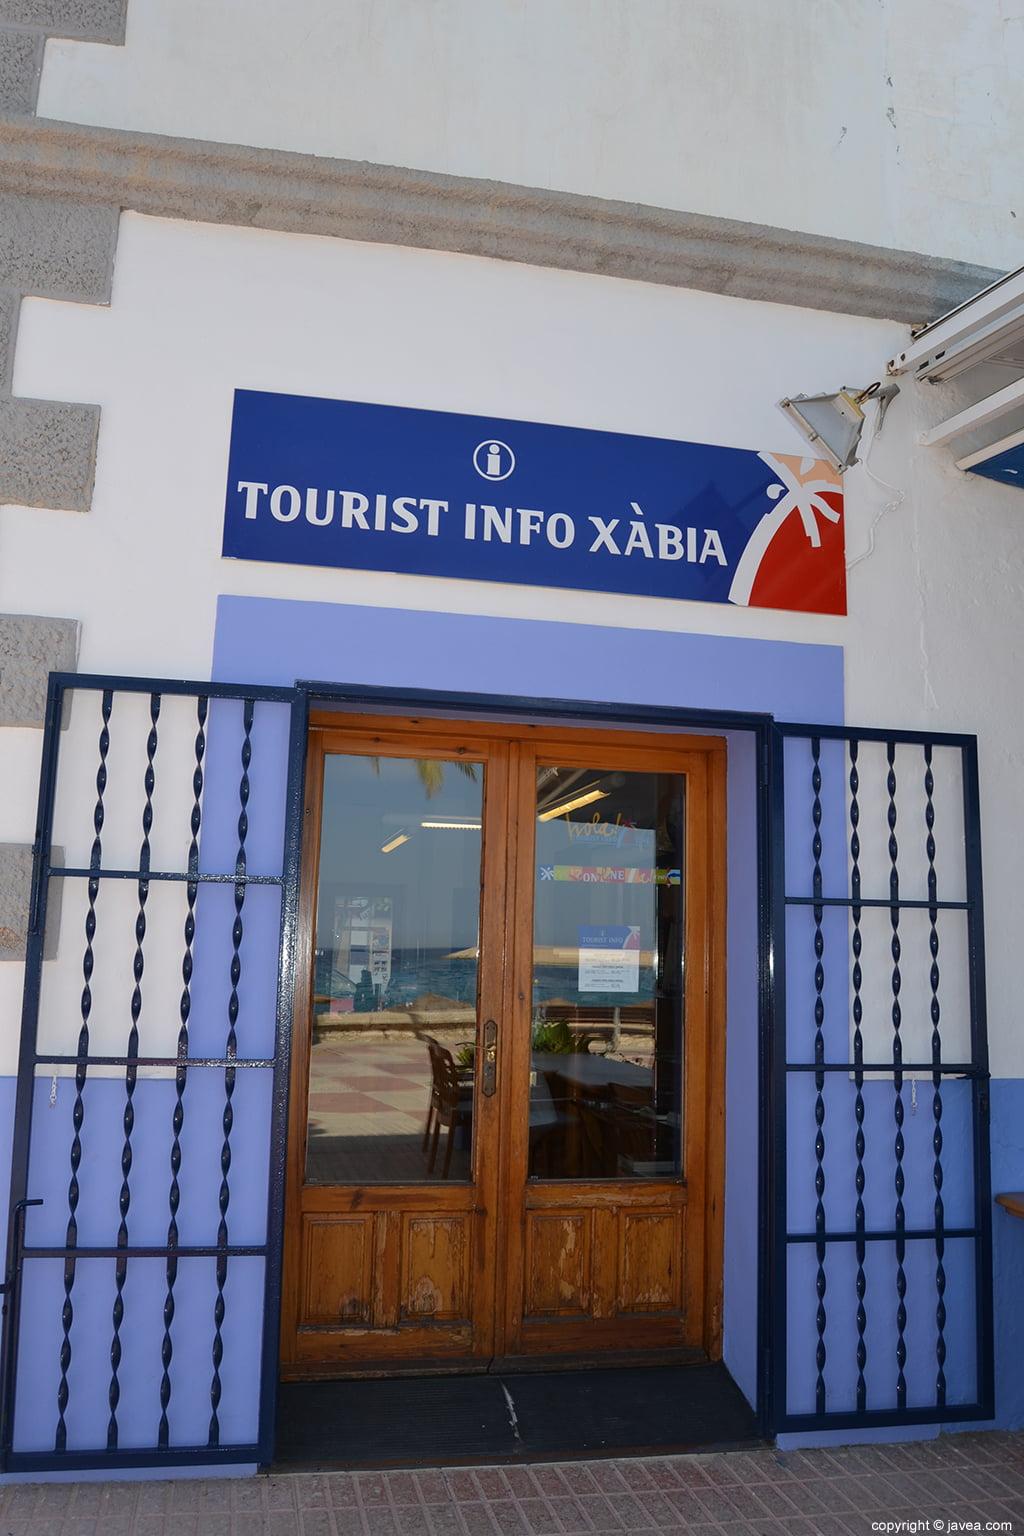 Oficina de turismo en j vea j x for Oficina de turismo ibiza